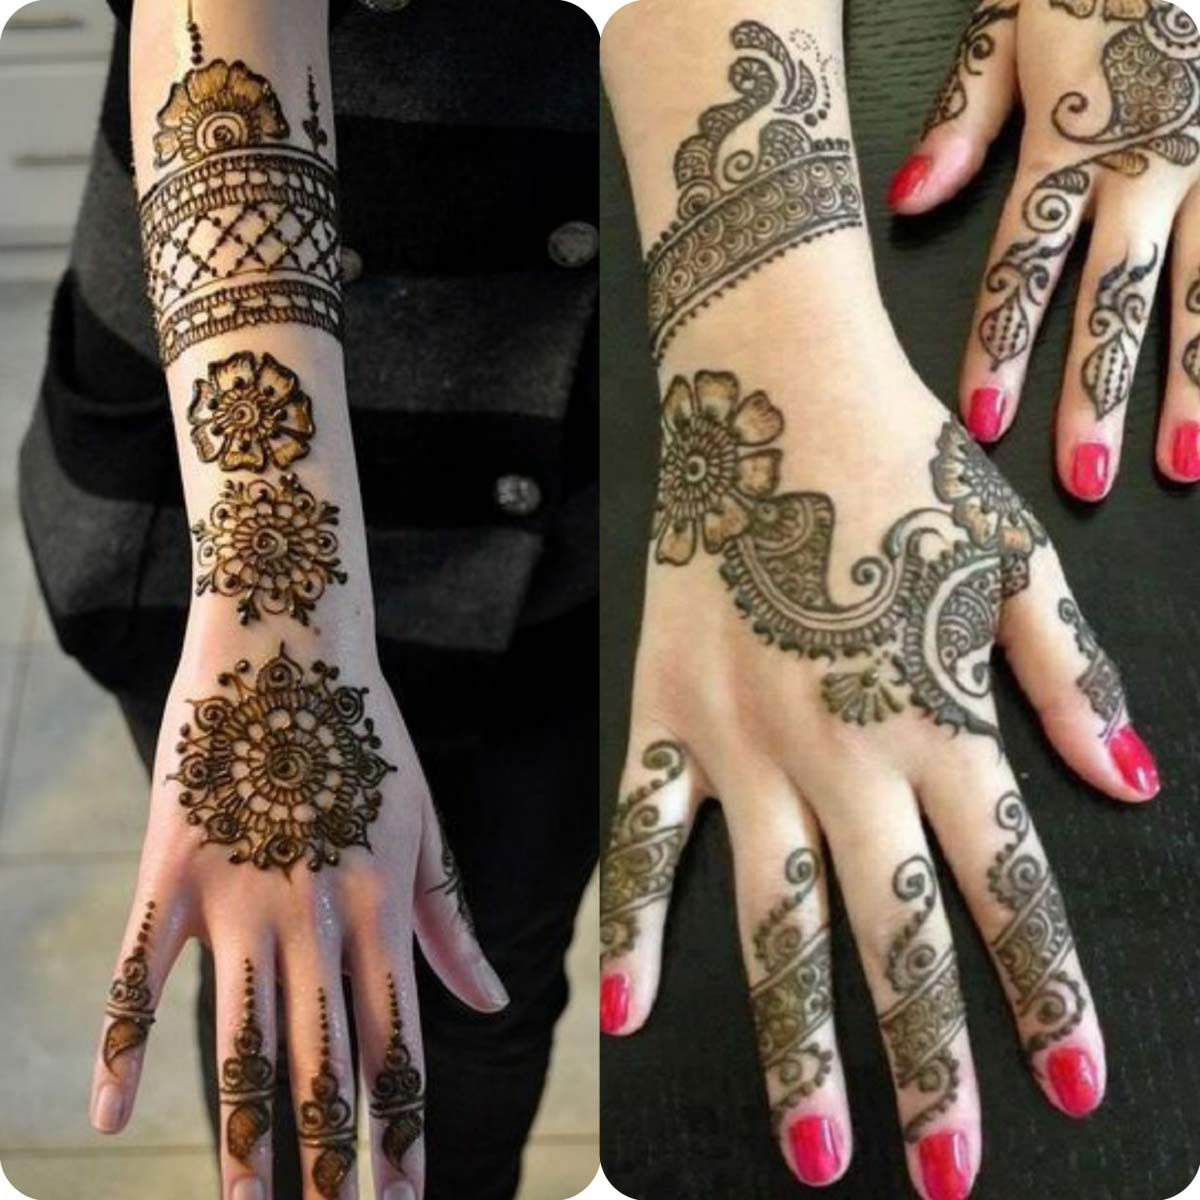 Latest Eid Mehndi Designs for Girls- Speical Eid Collection 2016 (13)